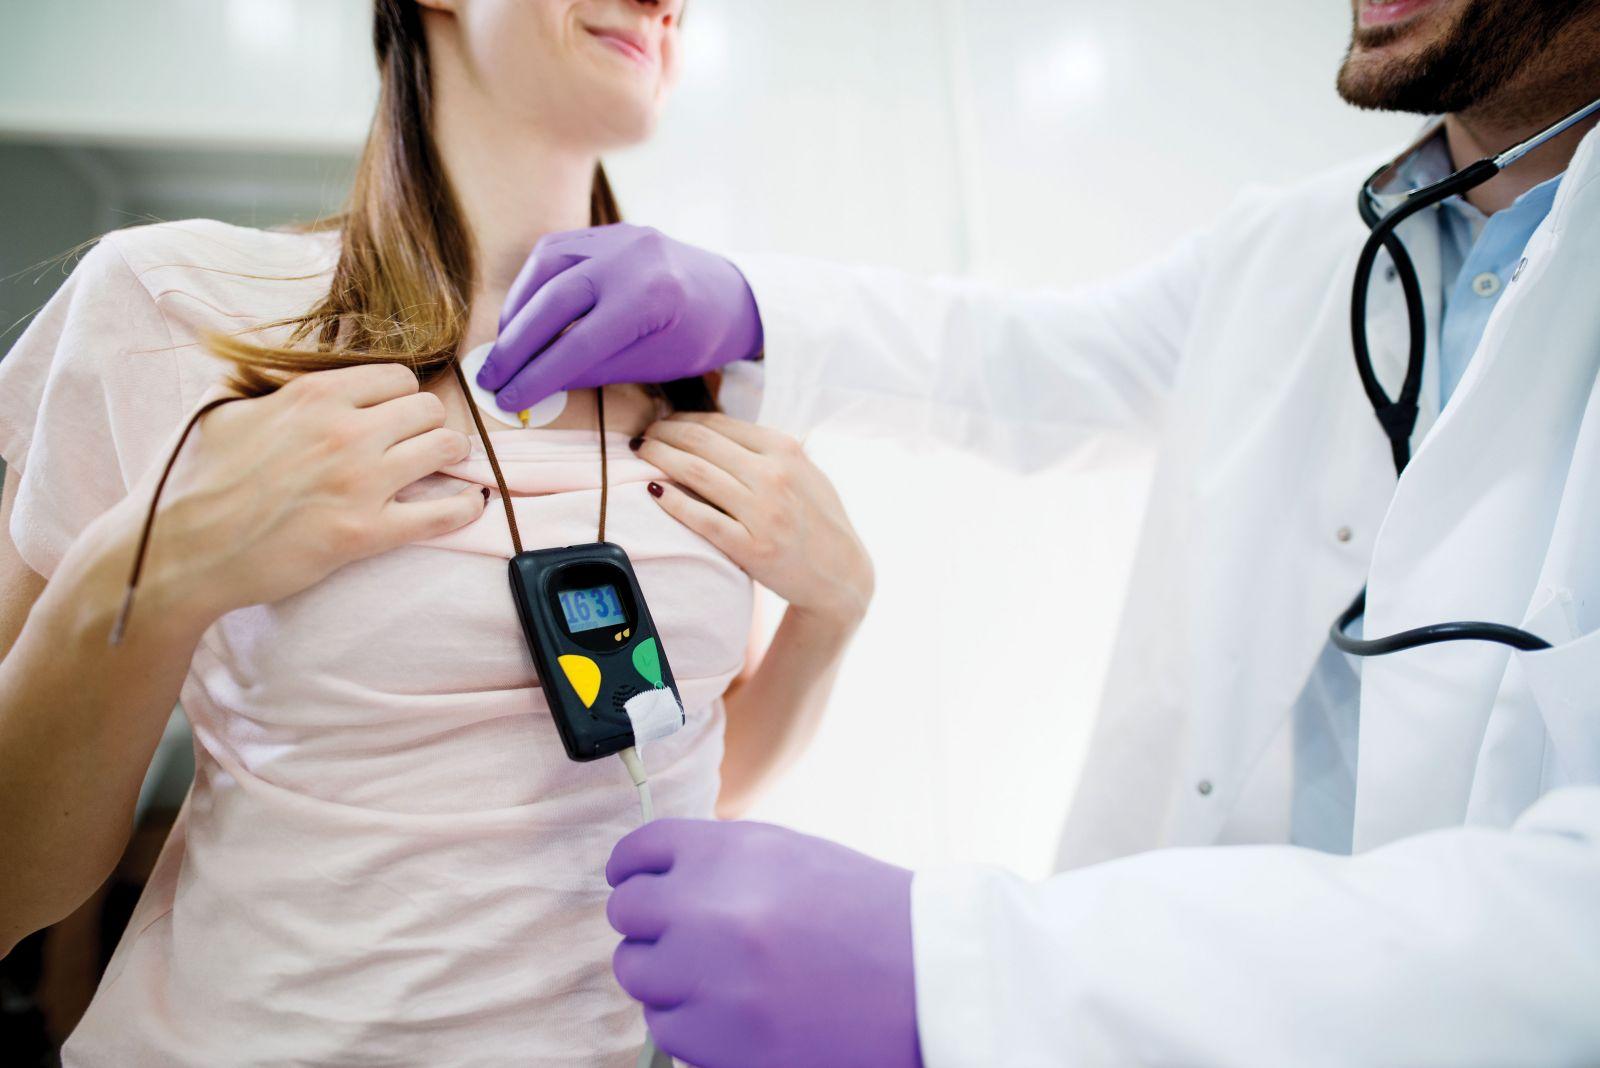 Heart palpitations: Mostly harmless - Harvard Health